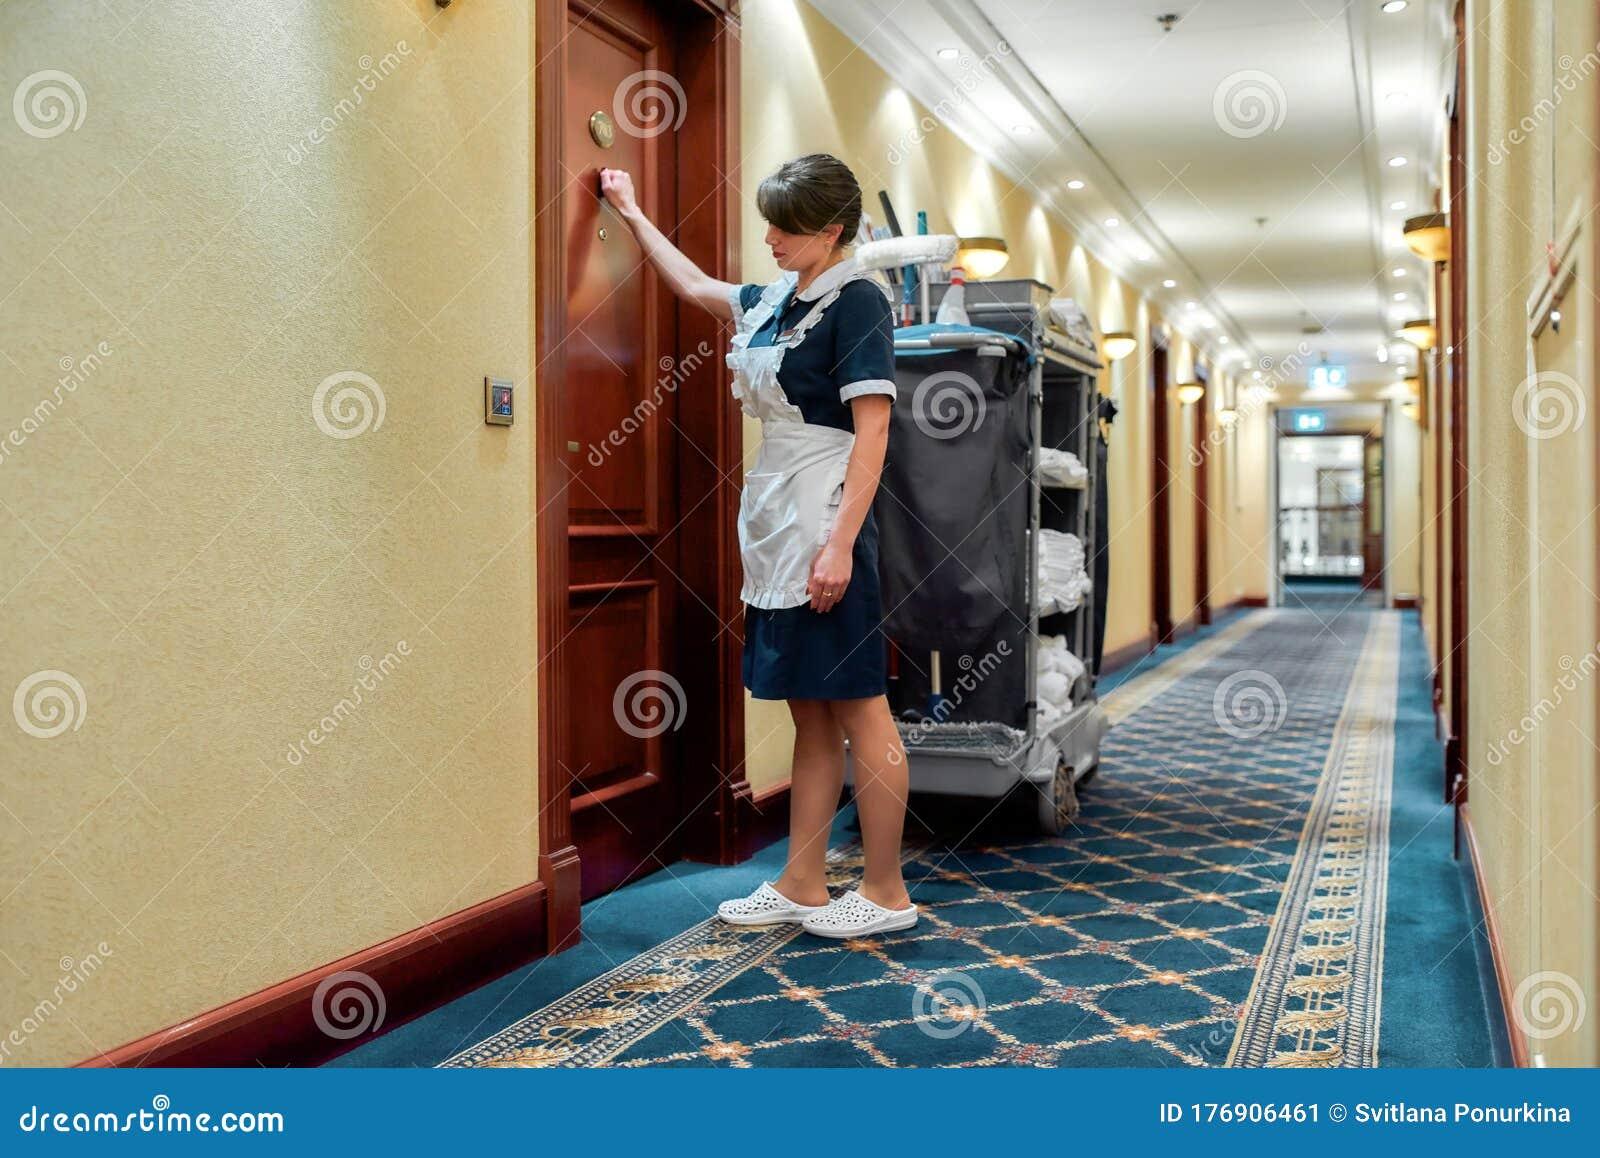 14 Room Service Trolley Photos - Free & Royalty-Free Stock Photos